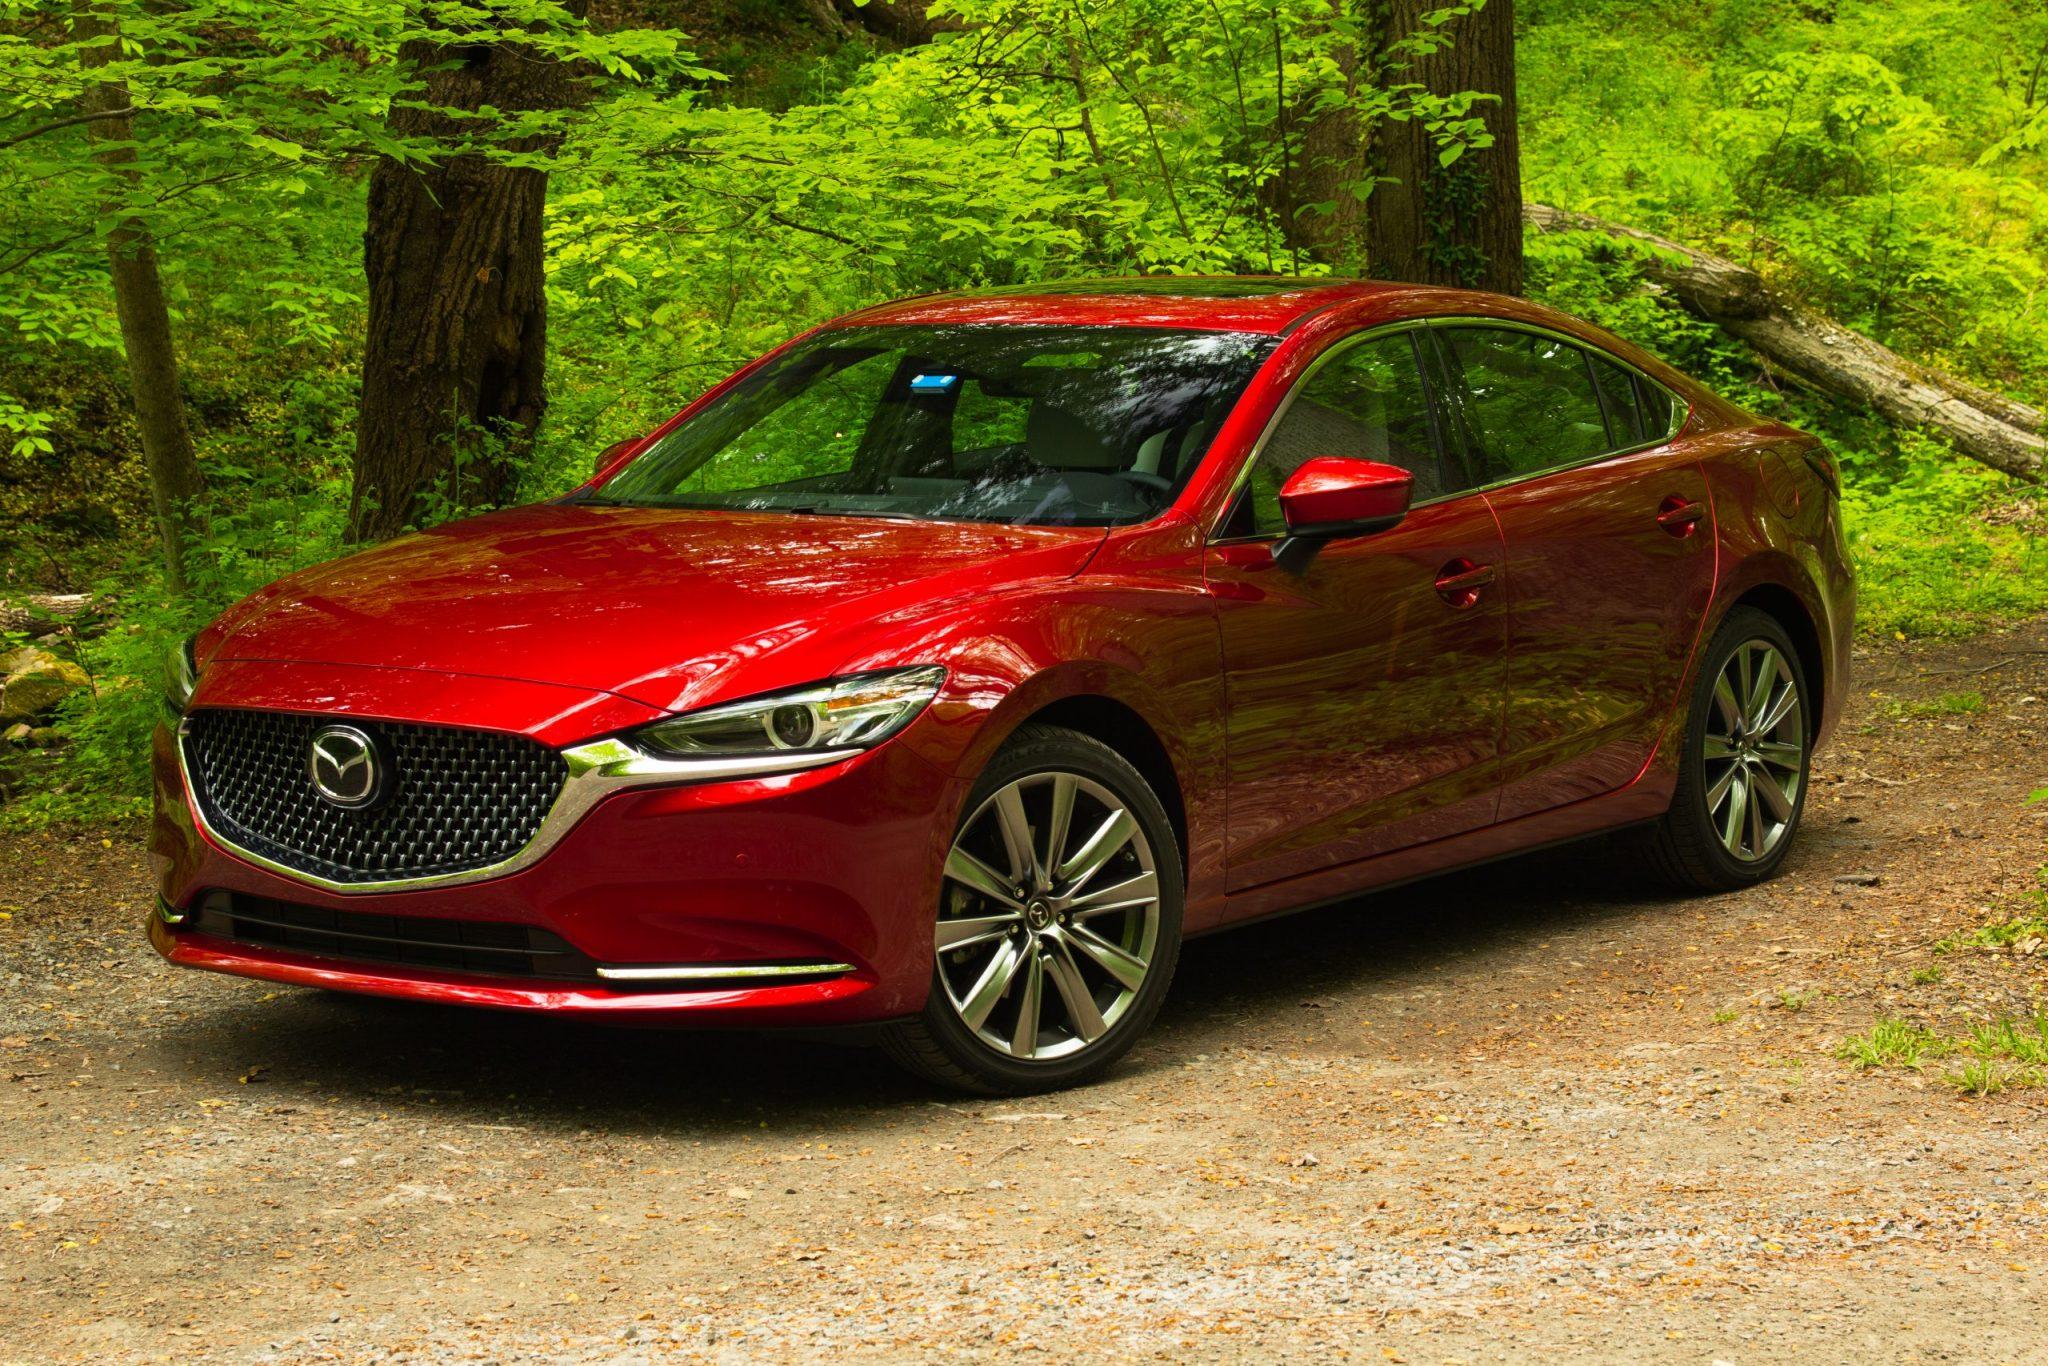 2020 Mazda6 Signature Turbo red